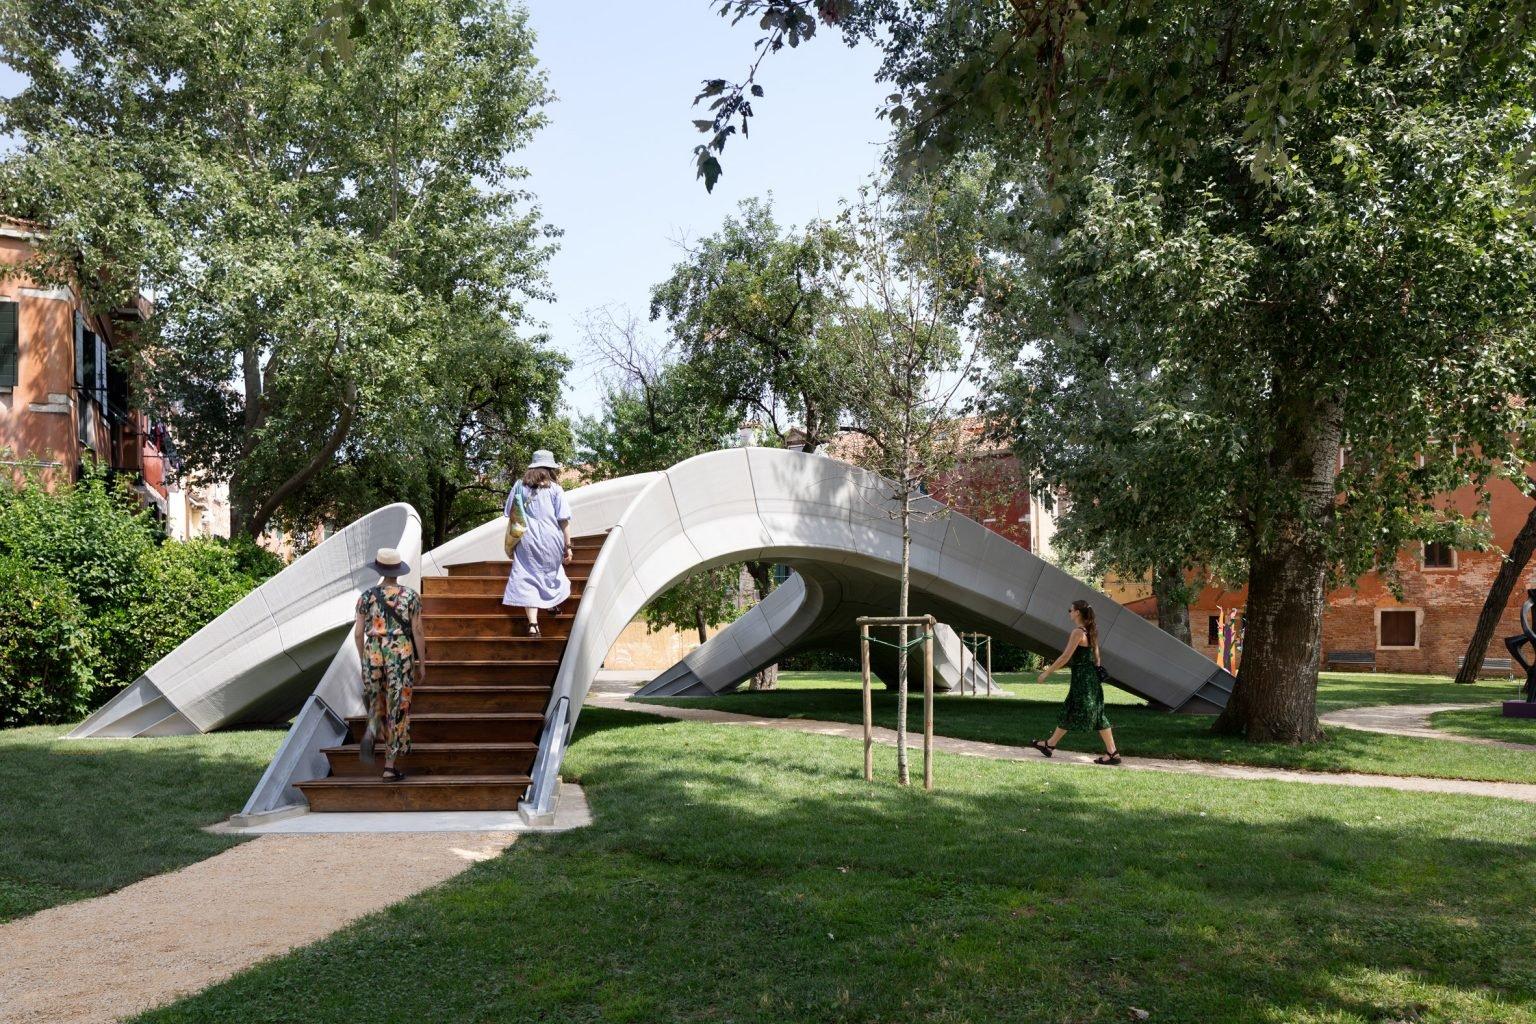 Naaro|Zaha Hadid Architects